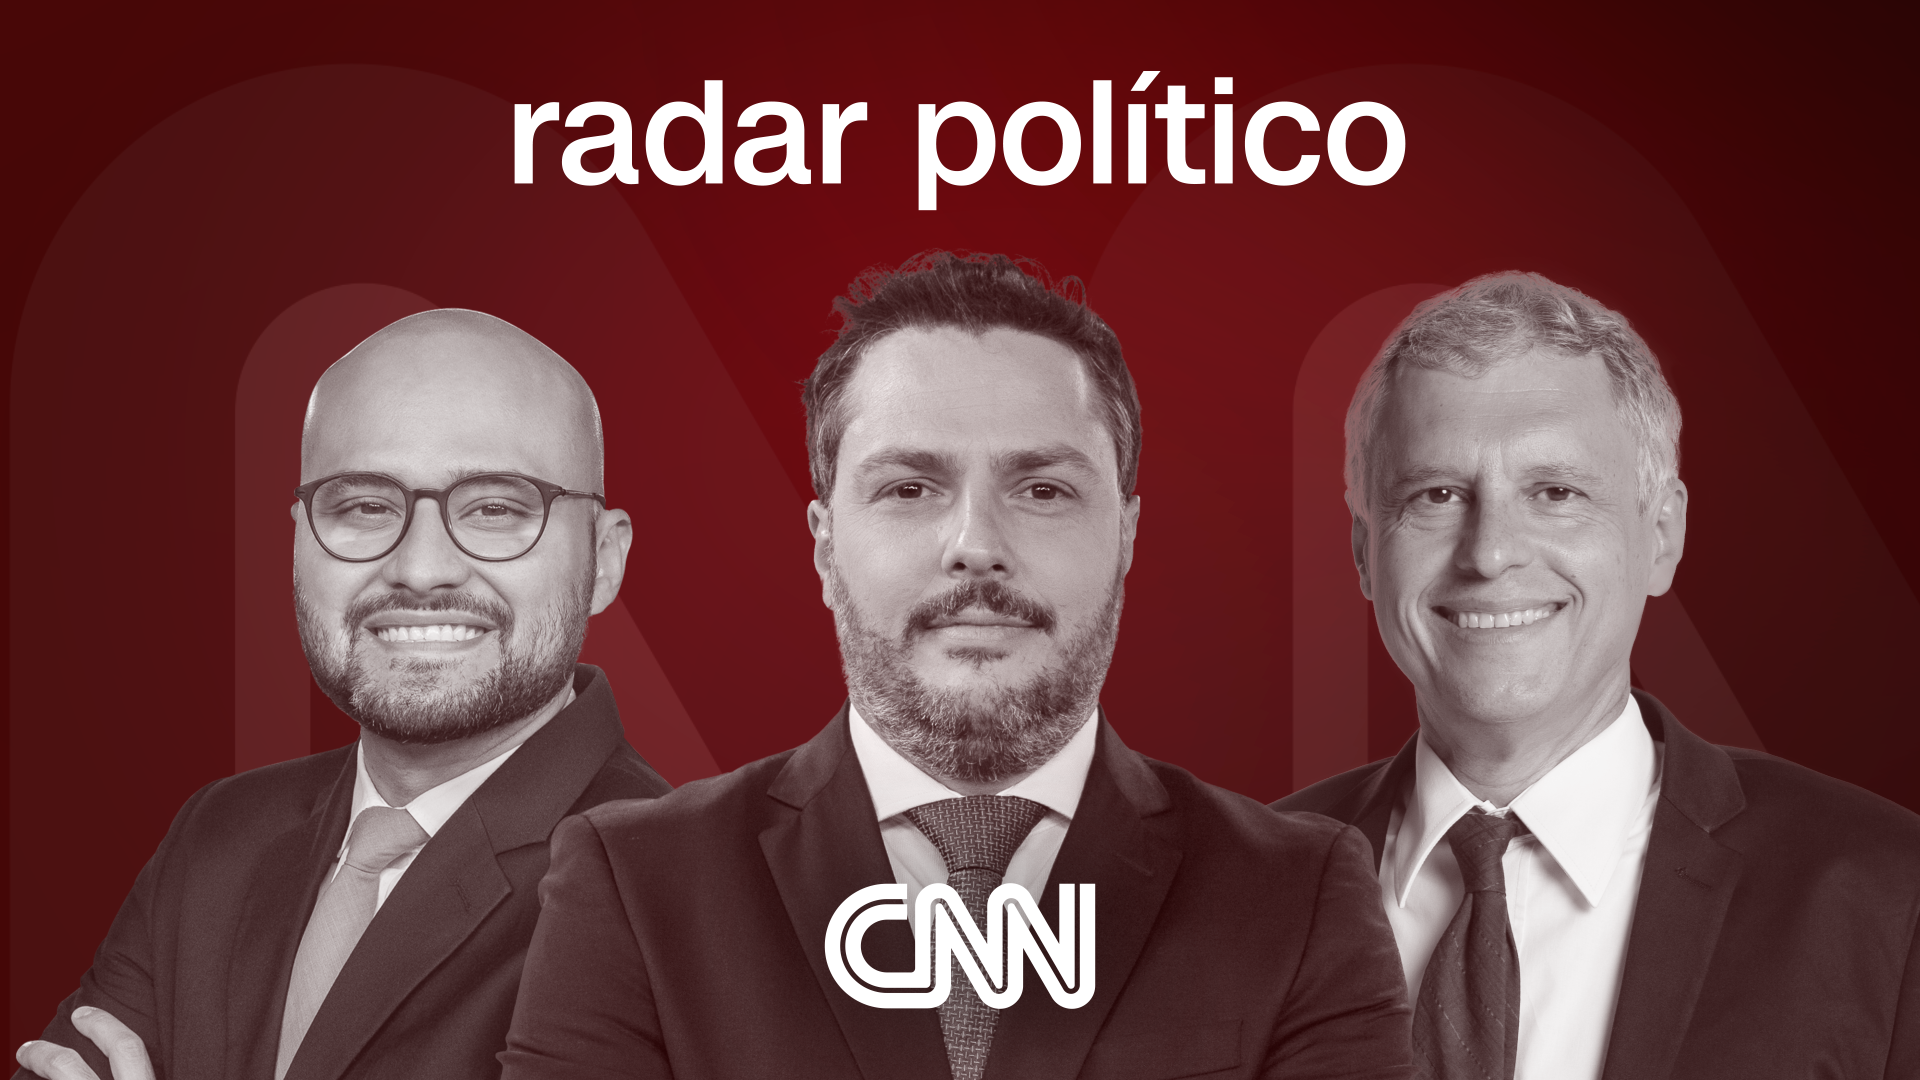 Cartela Radar Político - Rádio CNN